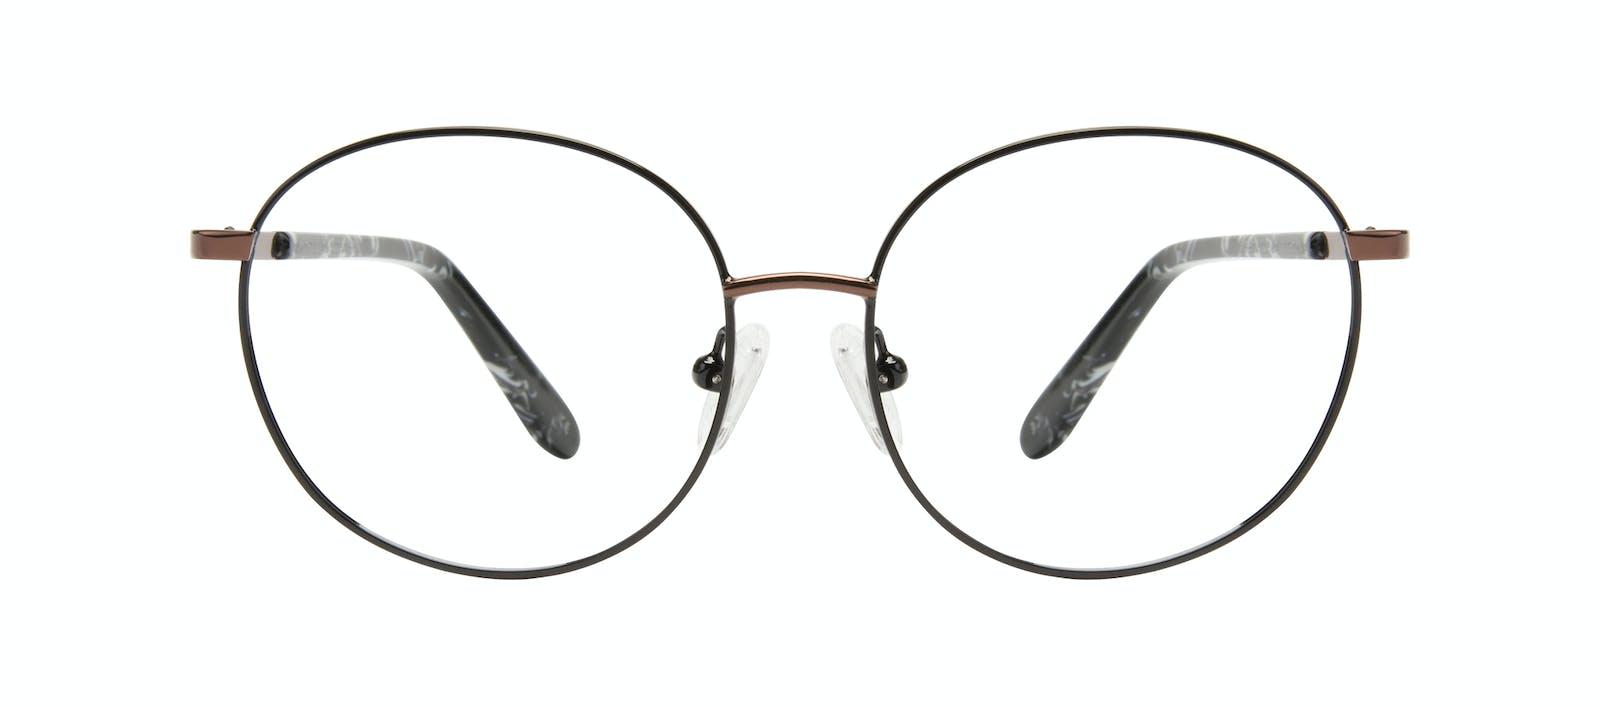 07662b93c18 Affordable Fashion Glasses Round Eyeglasses Women Joy Petite Black Copper  Front